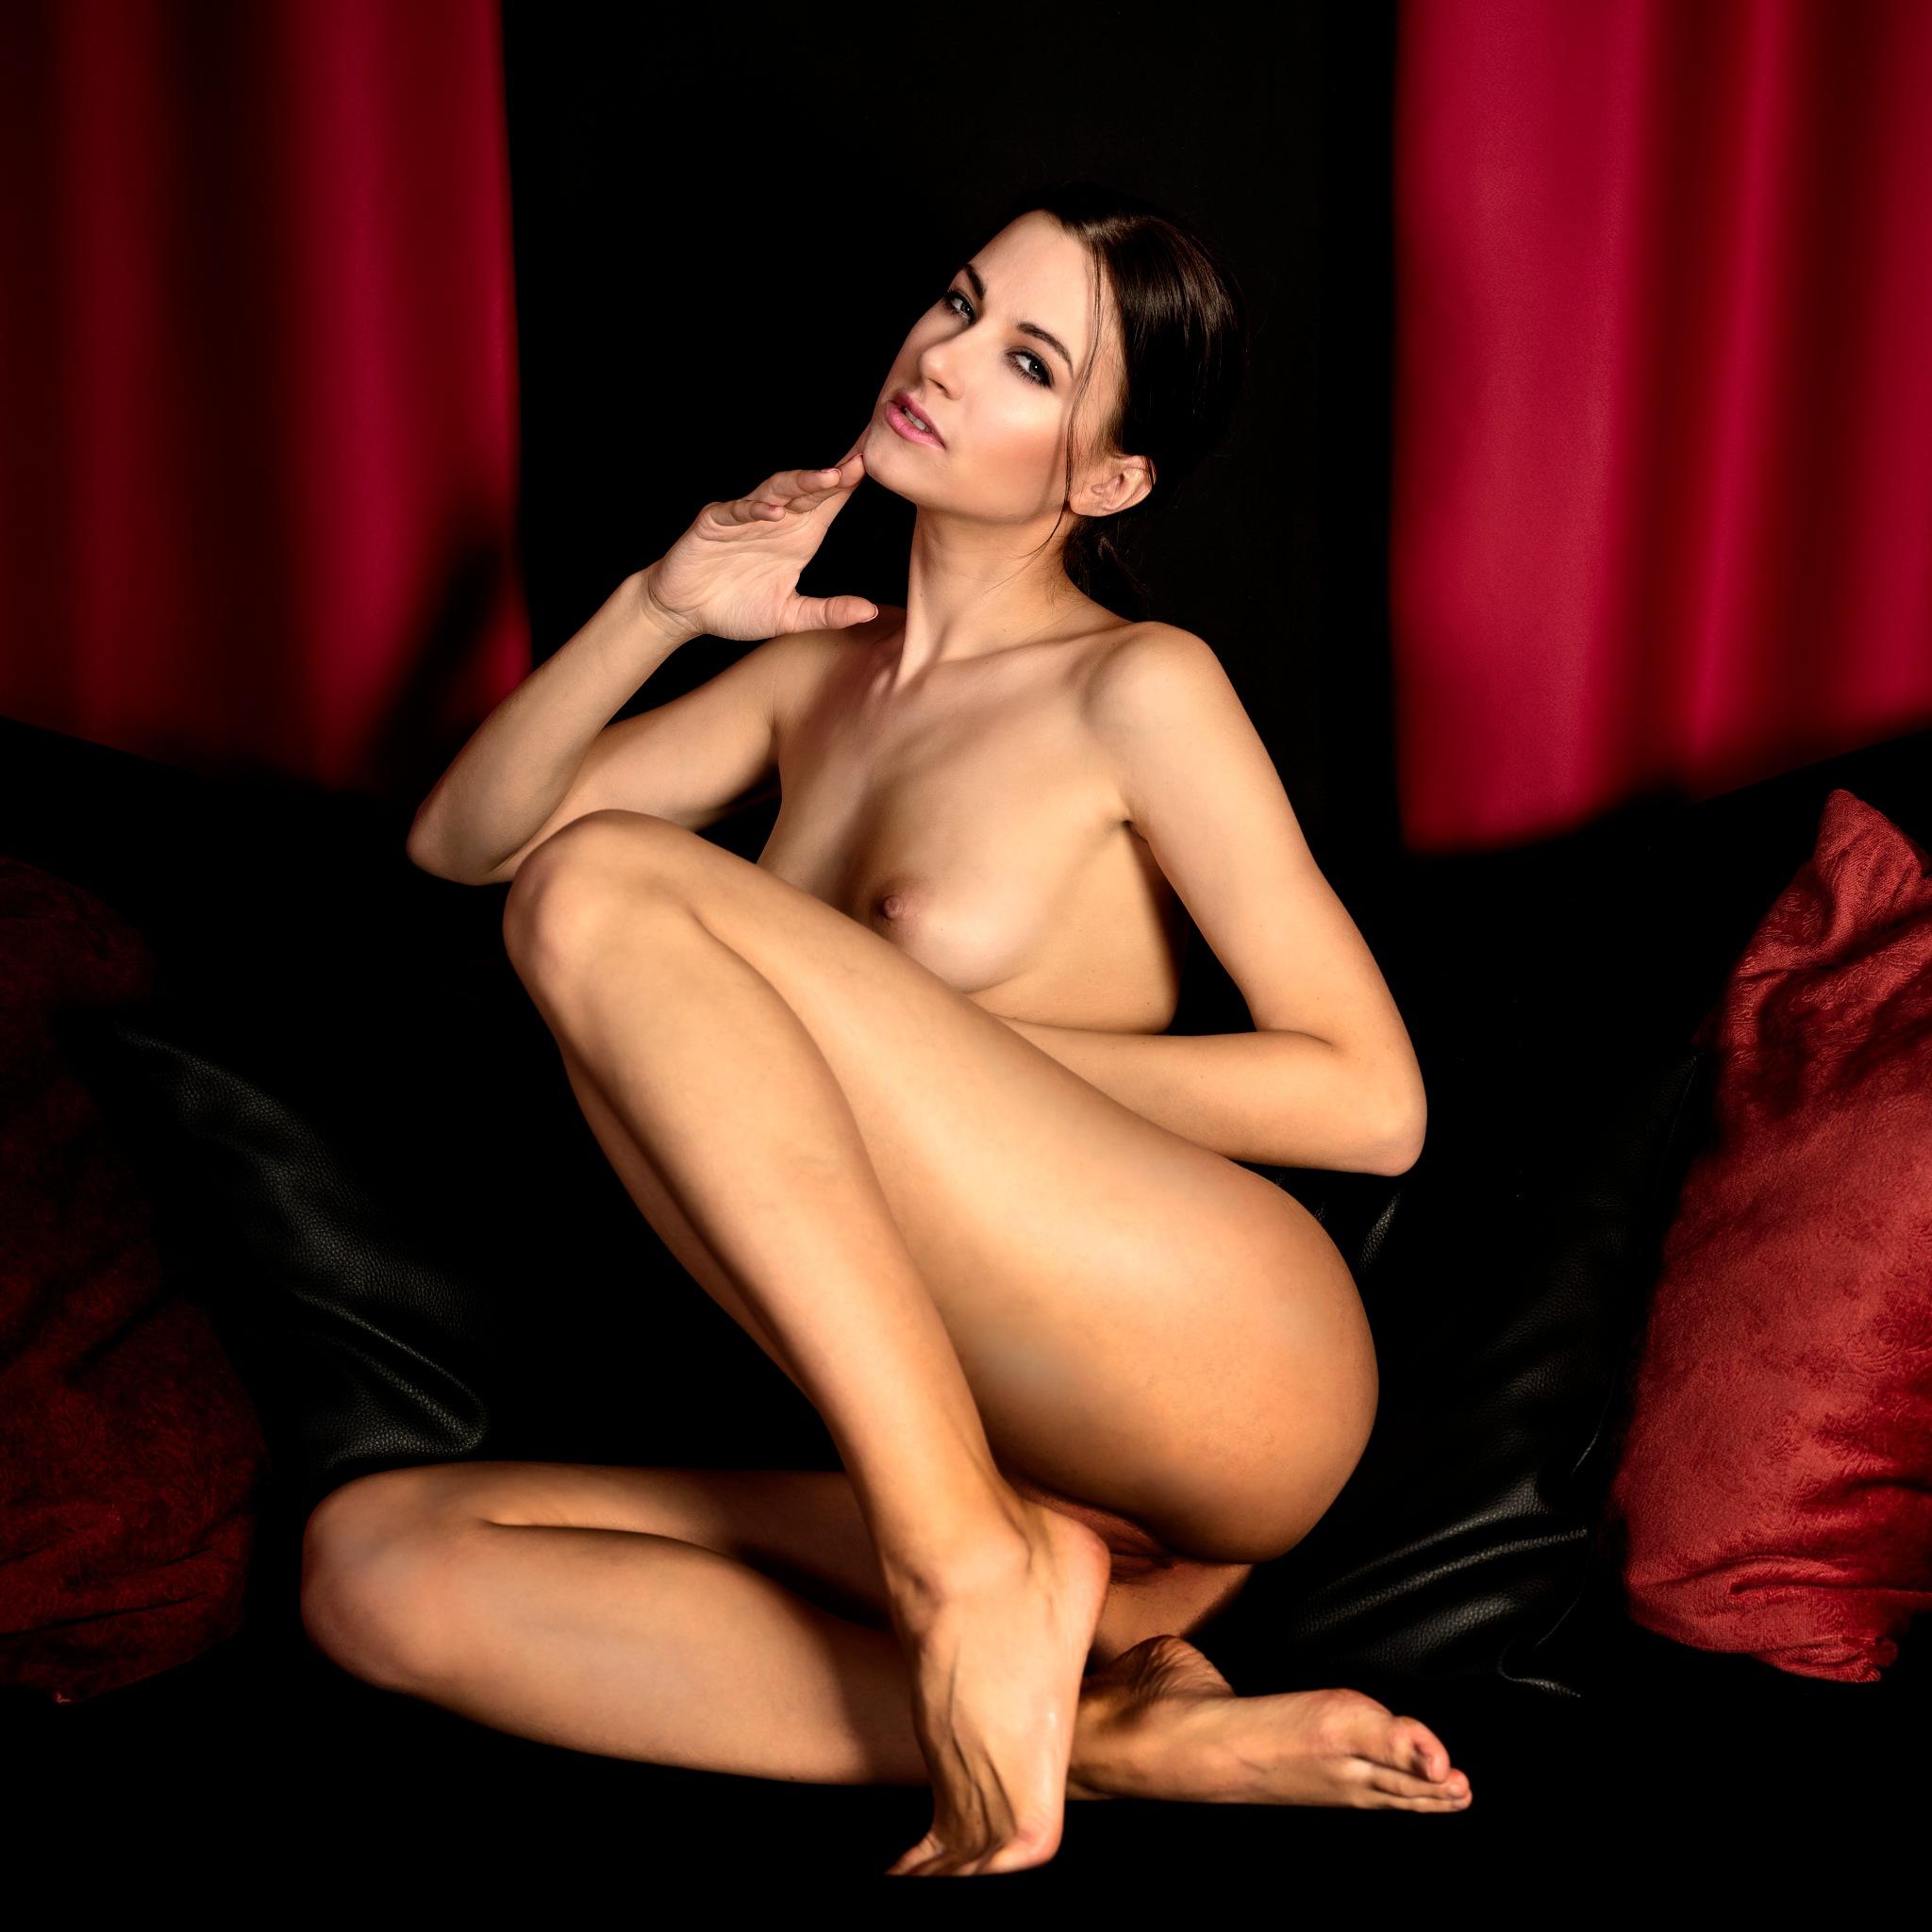 Lauren nude on sofa by JHFotowereld